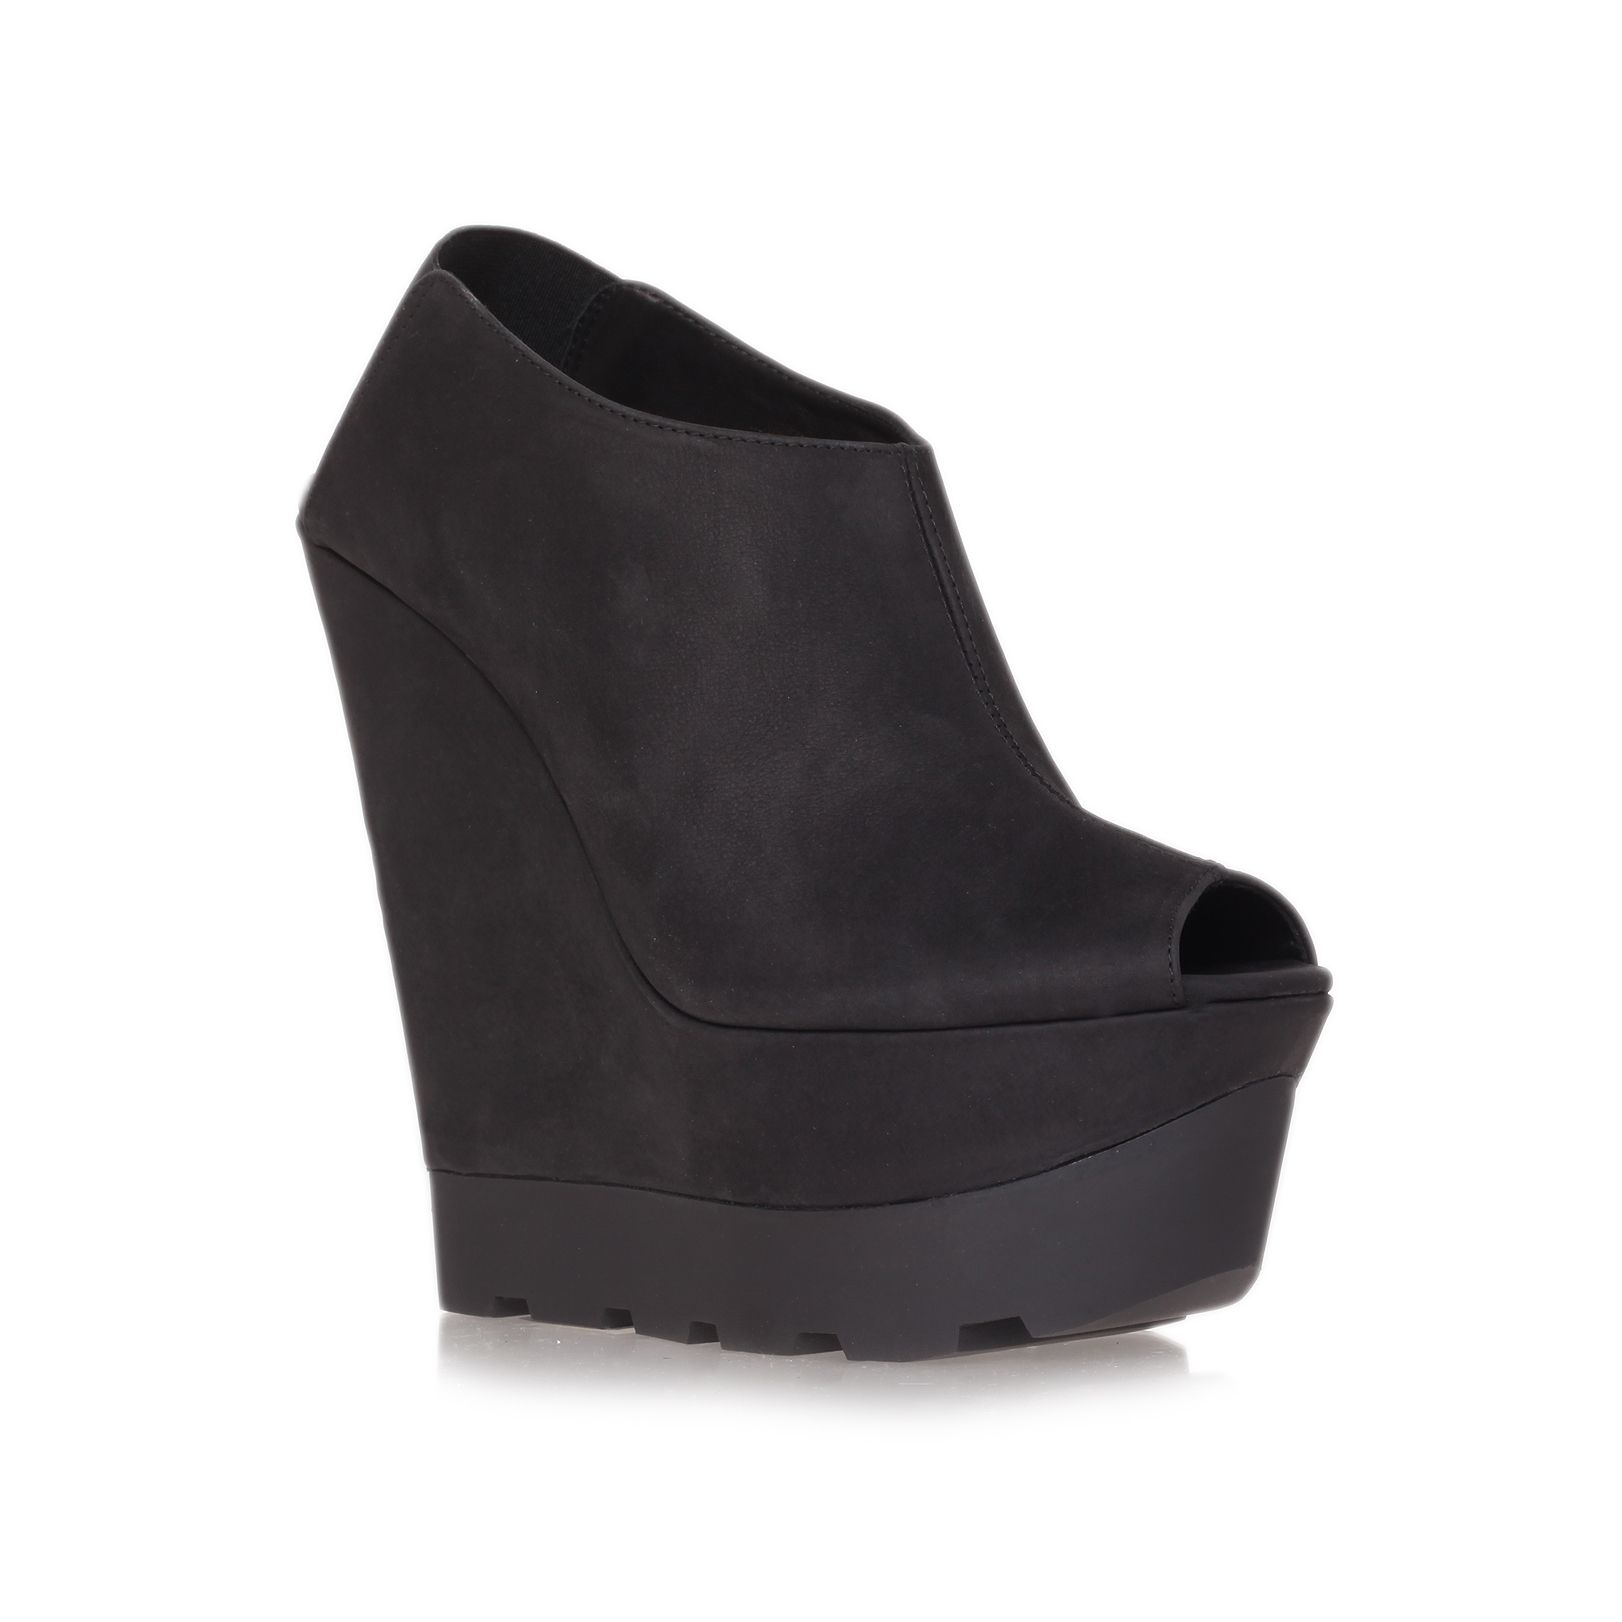 Kurt geiger grace high heel wedge, court shoes, high (80mm and above